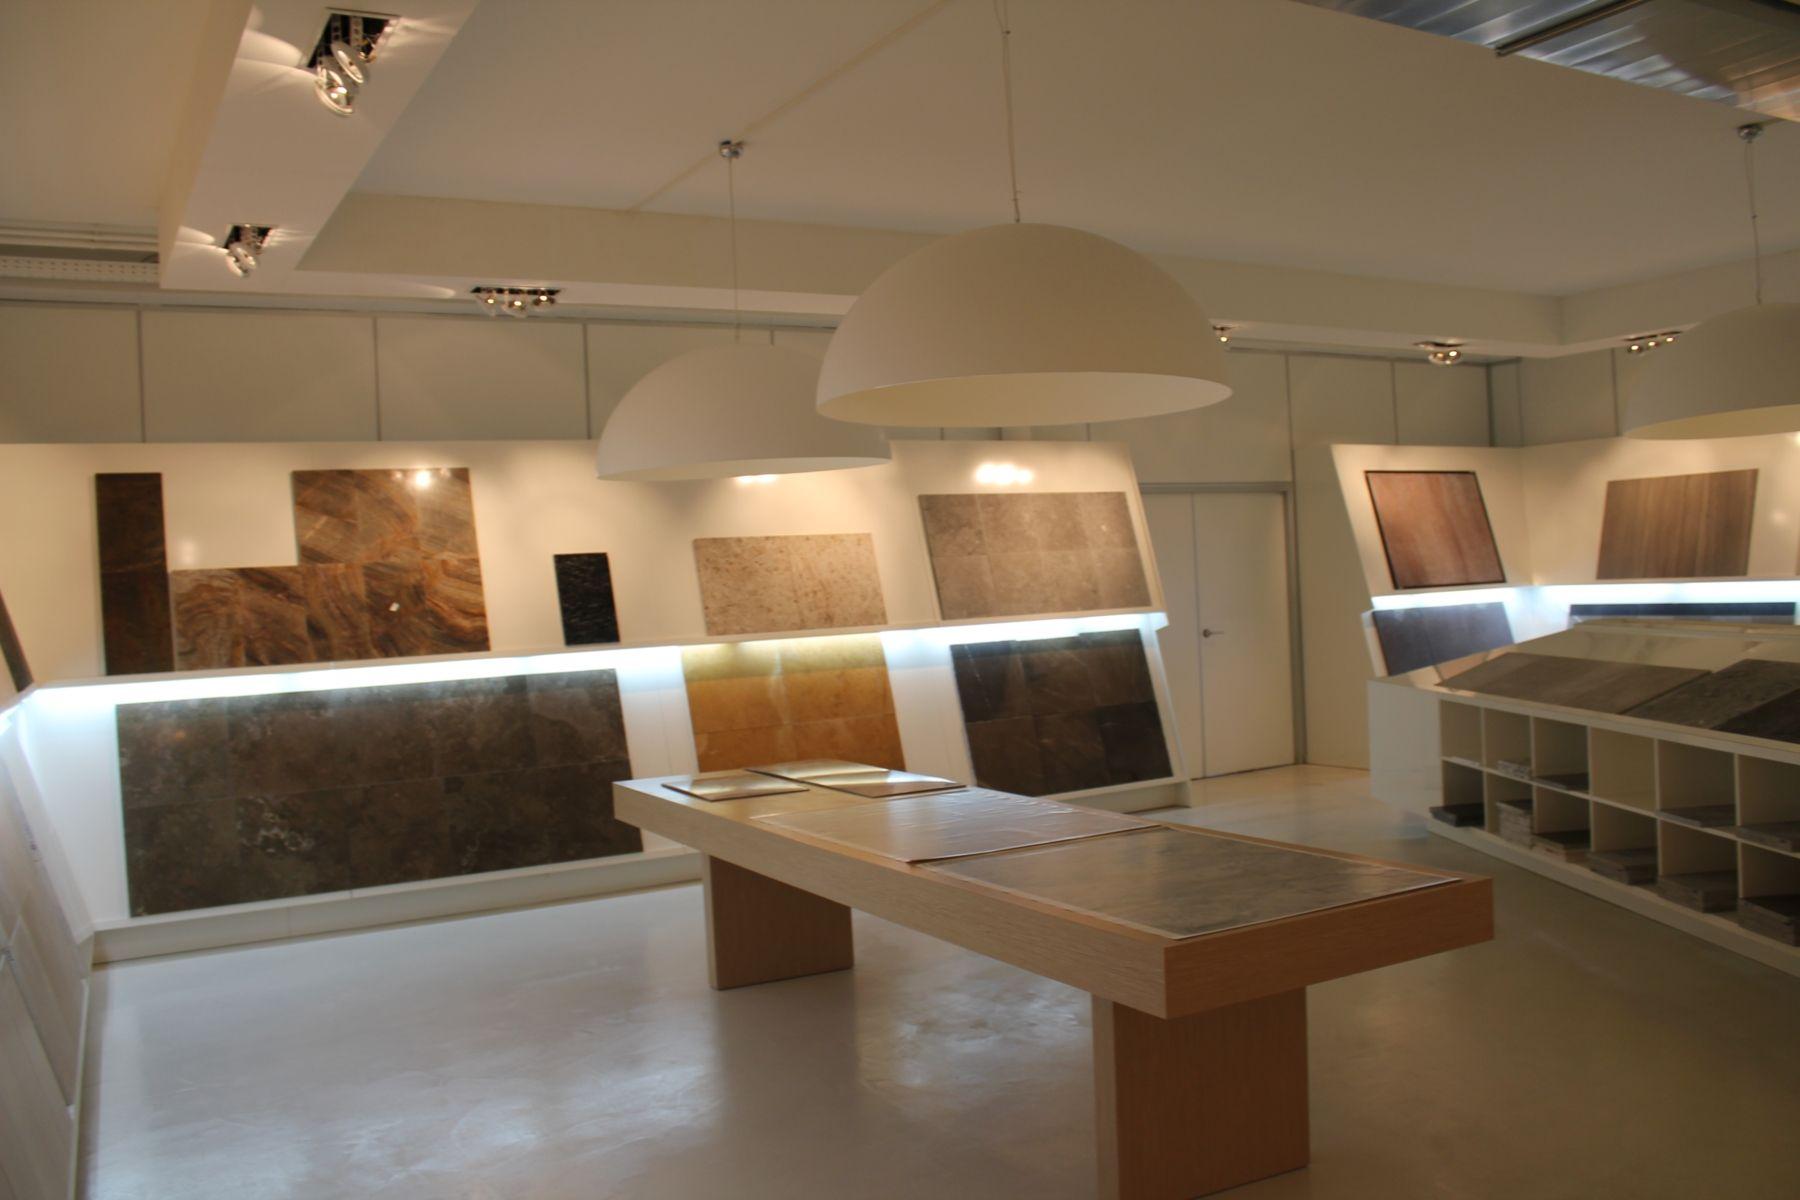 Image result for tiles display showroom | Showroom Tiles | Pinterest ...